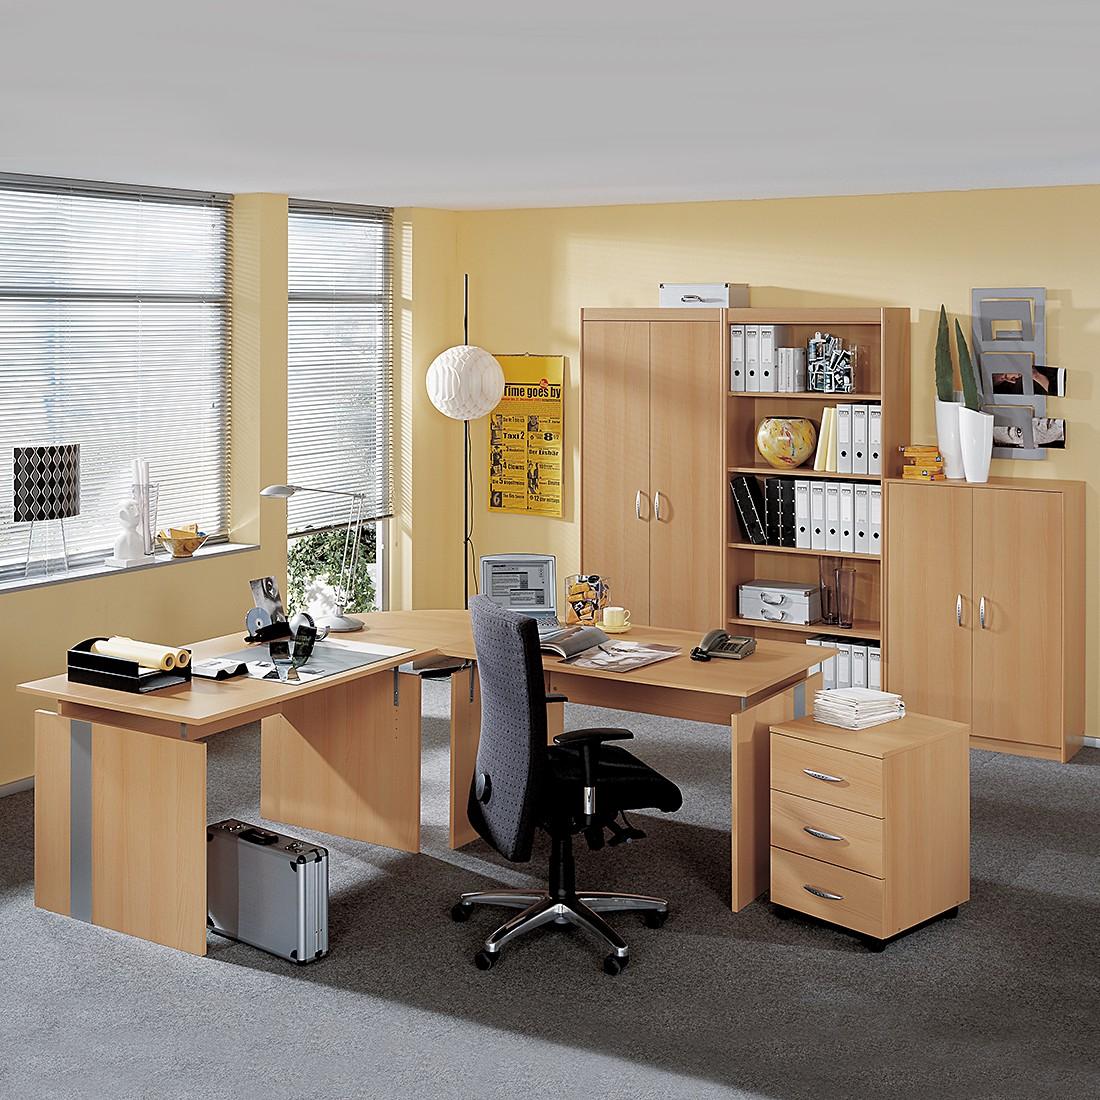 Mobilier de bureau Tomas